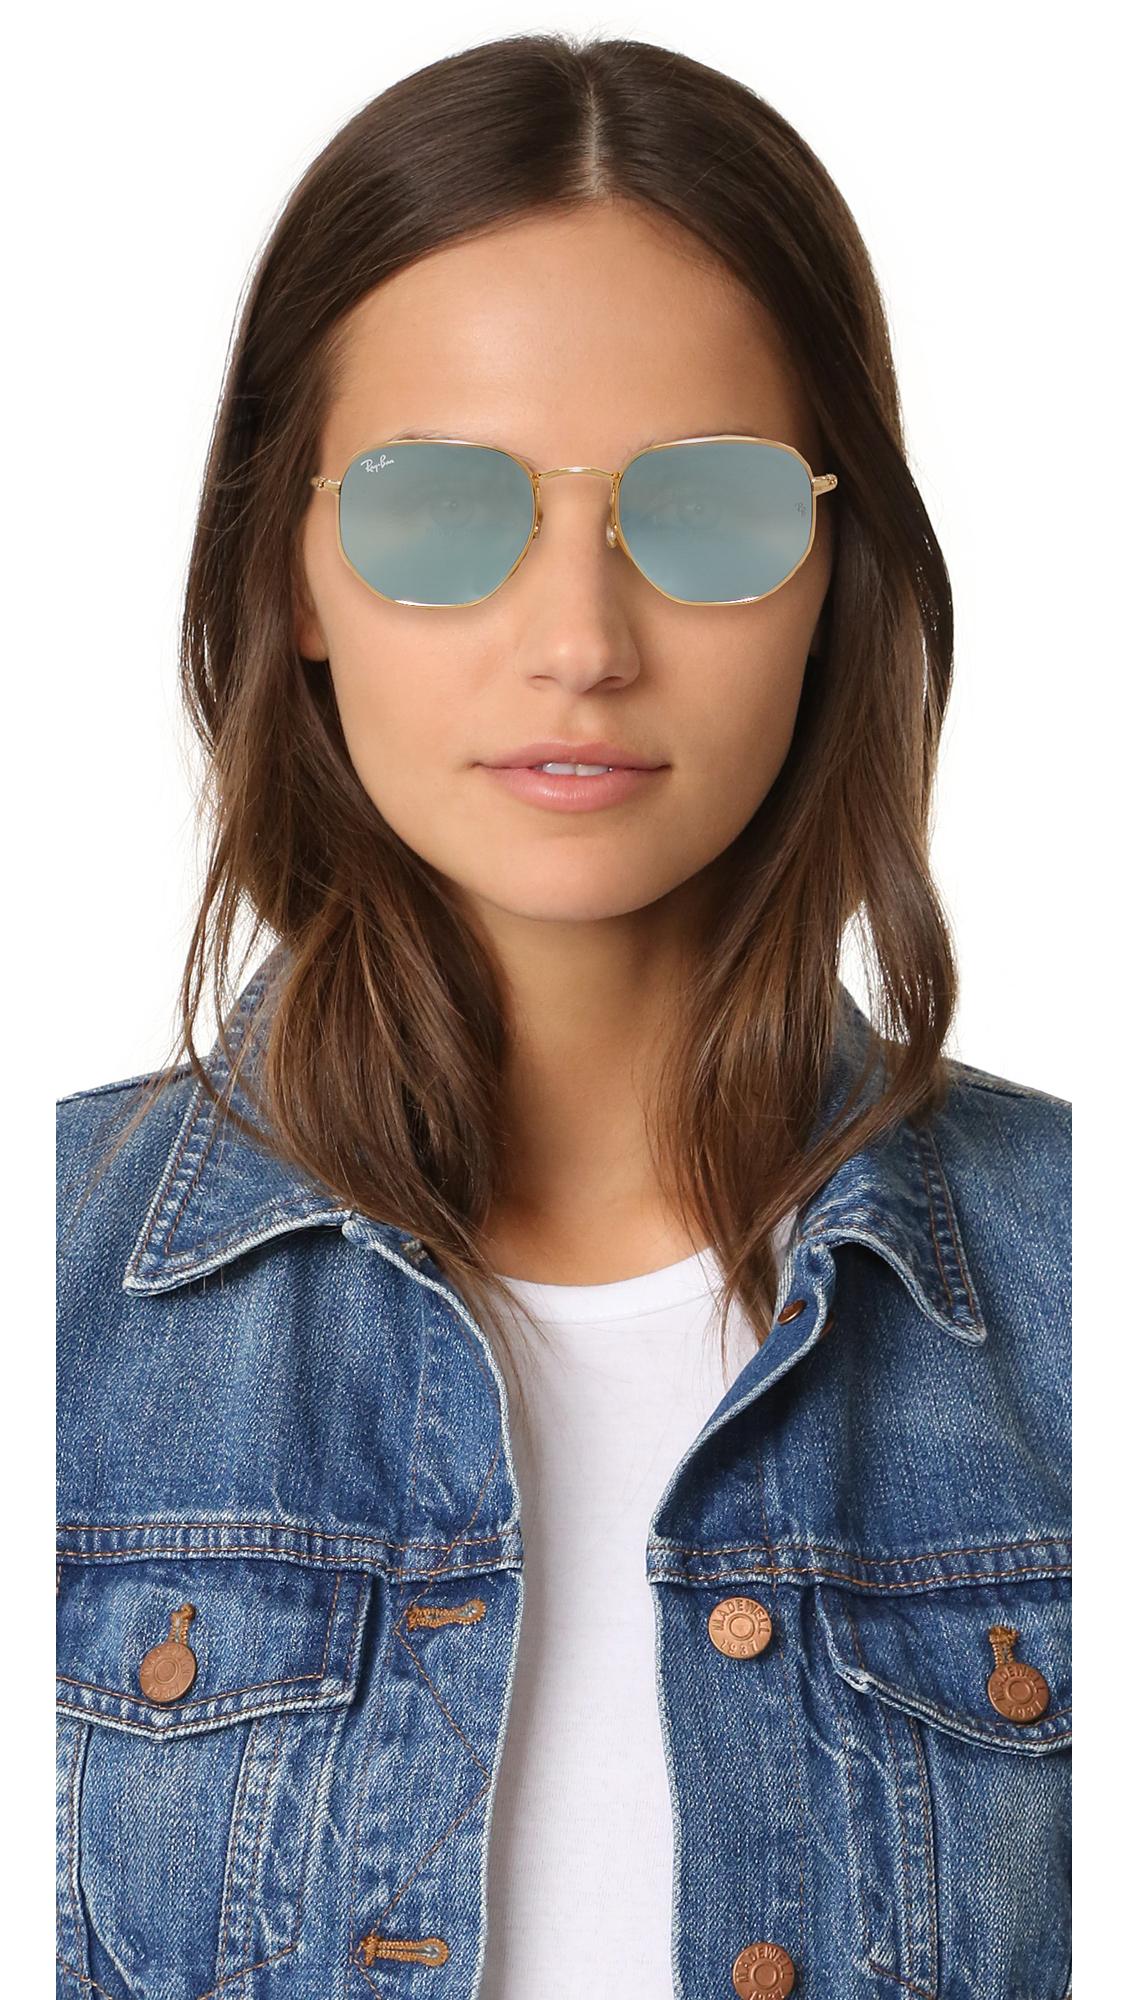 e827f21f7cad Ray-Ban Hexagonal Sunglasses